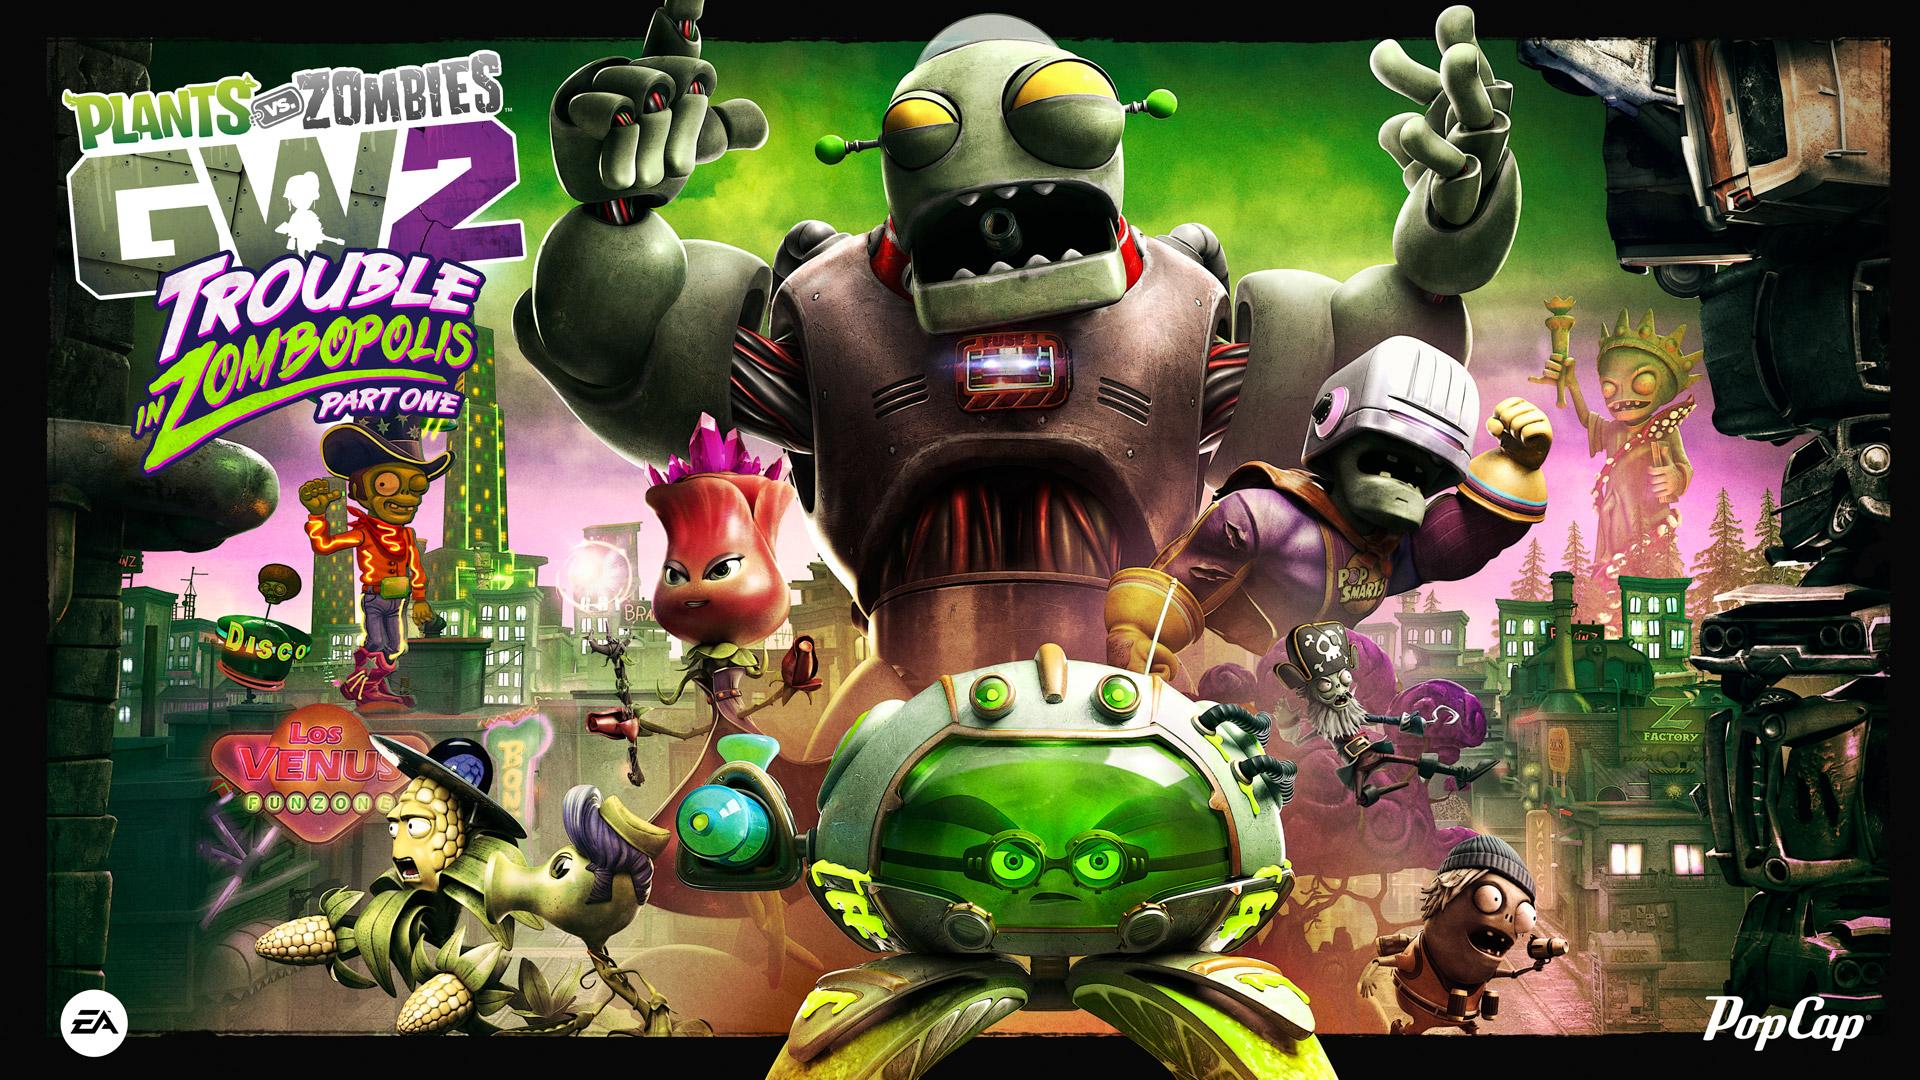 New Content Announced For Plants vs. Zombies Garden Warfare 2